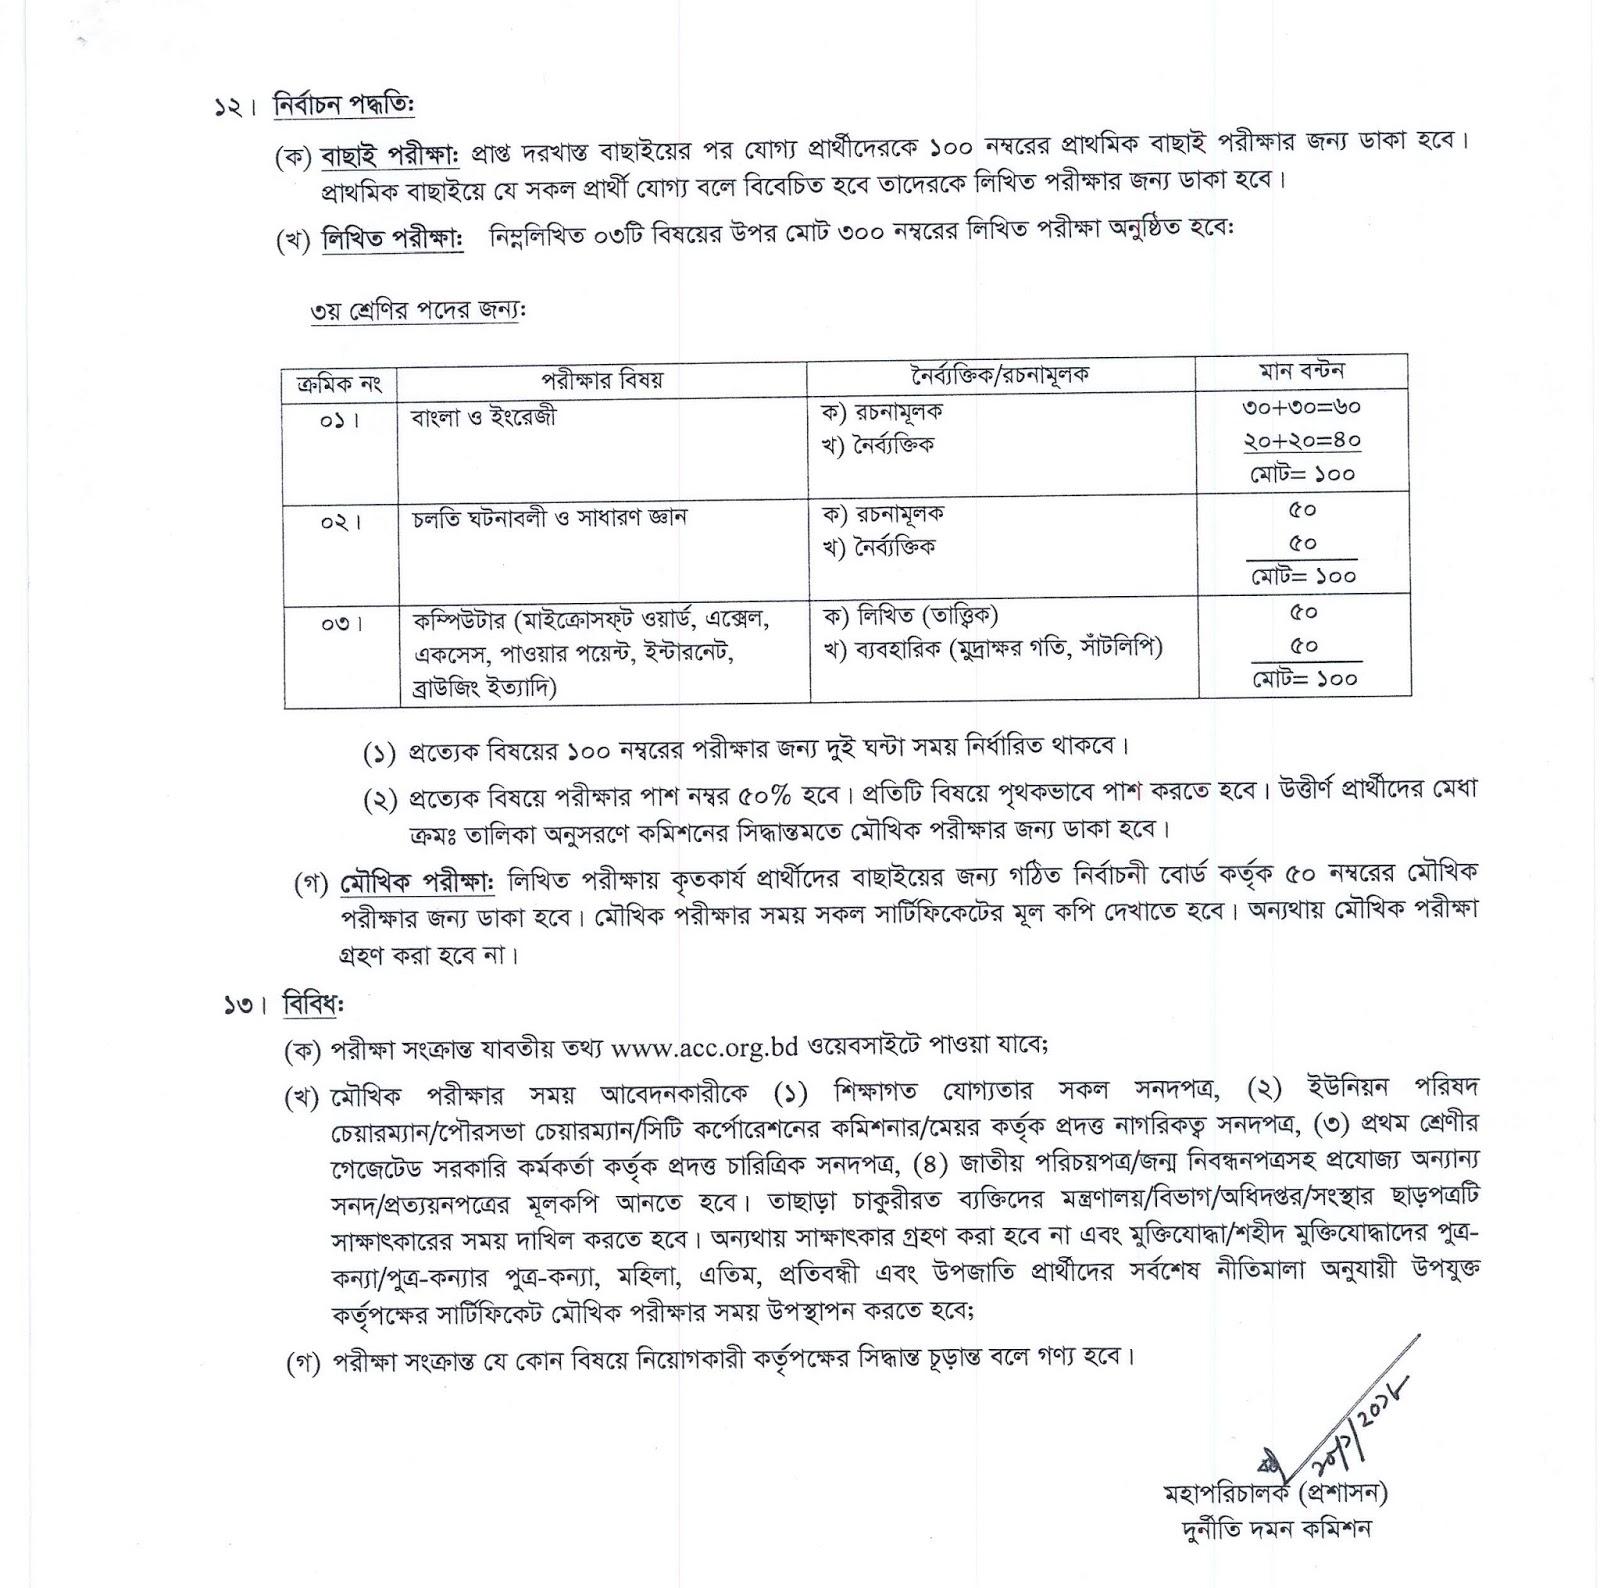 Anti-Corruption Commission (ACC) Job Exam Mark Distribution, Syllabus and Select Process